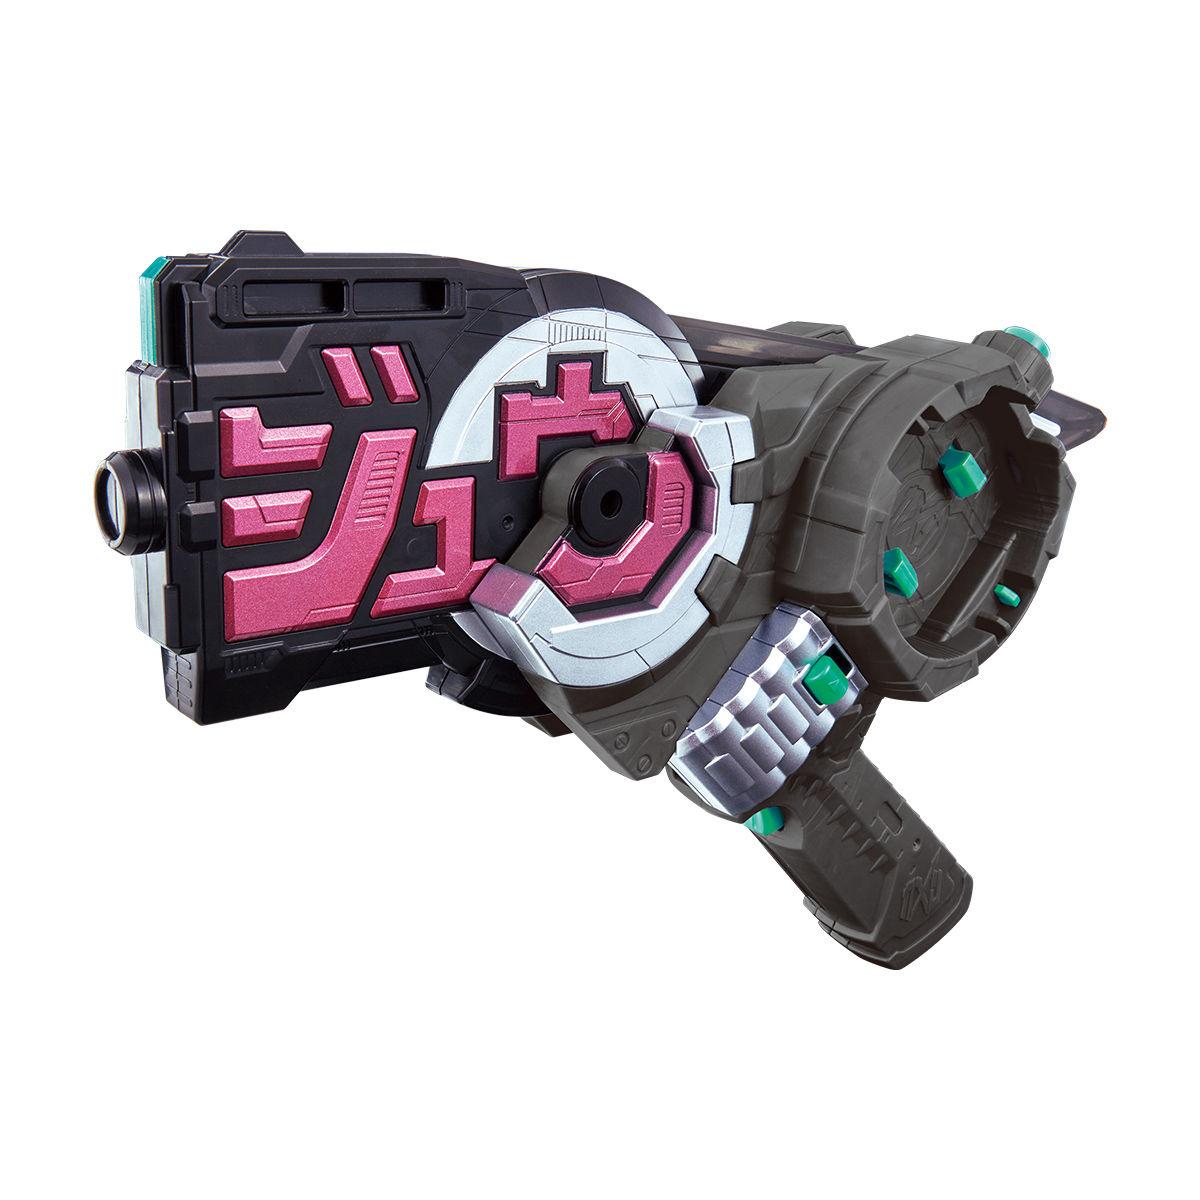 DXジカンギレード 仮面ライダージオウ